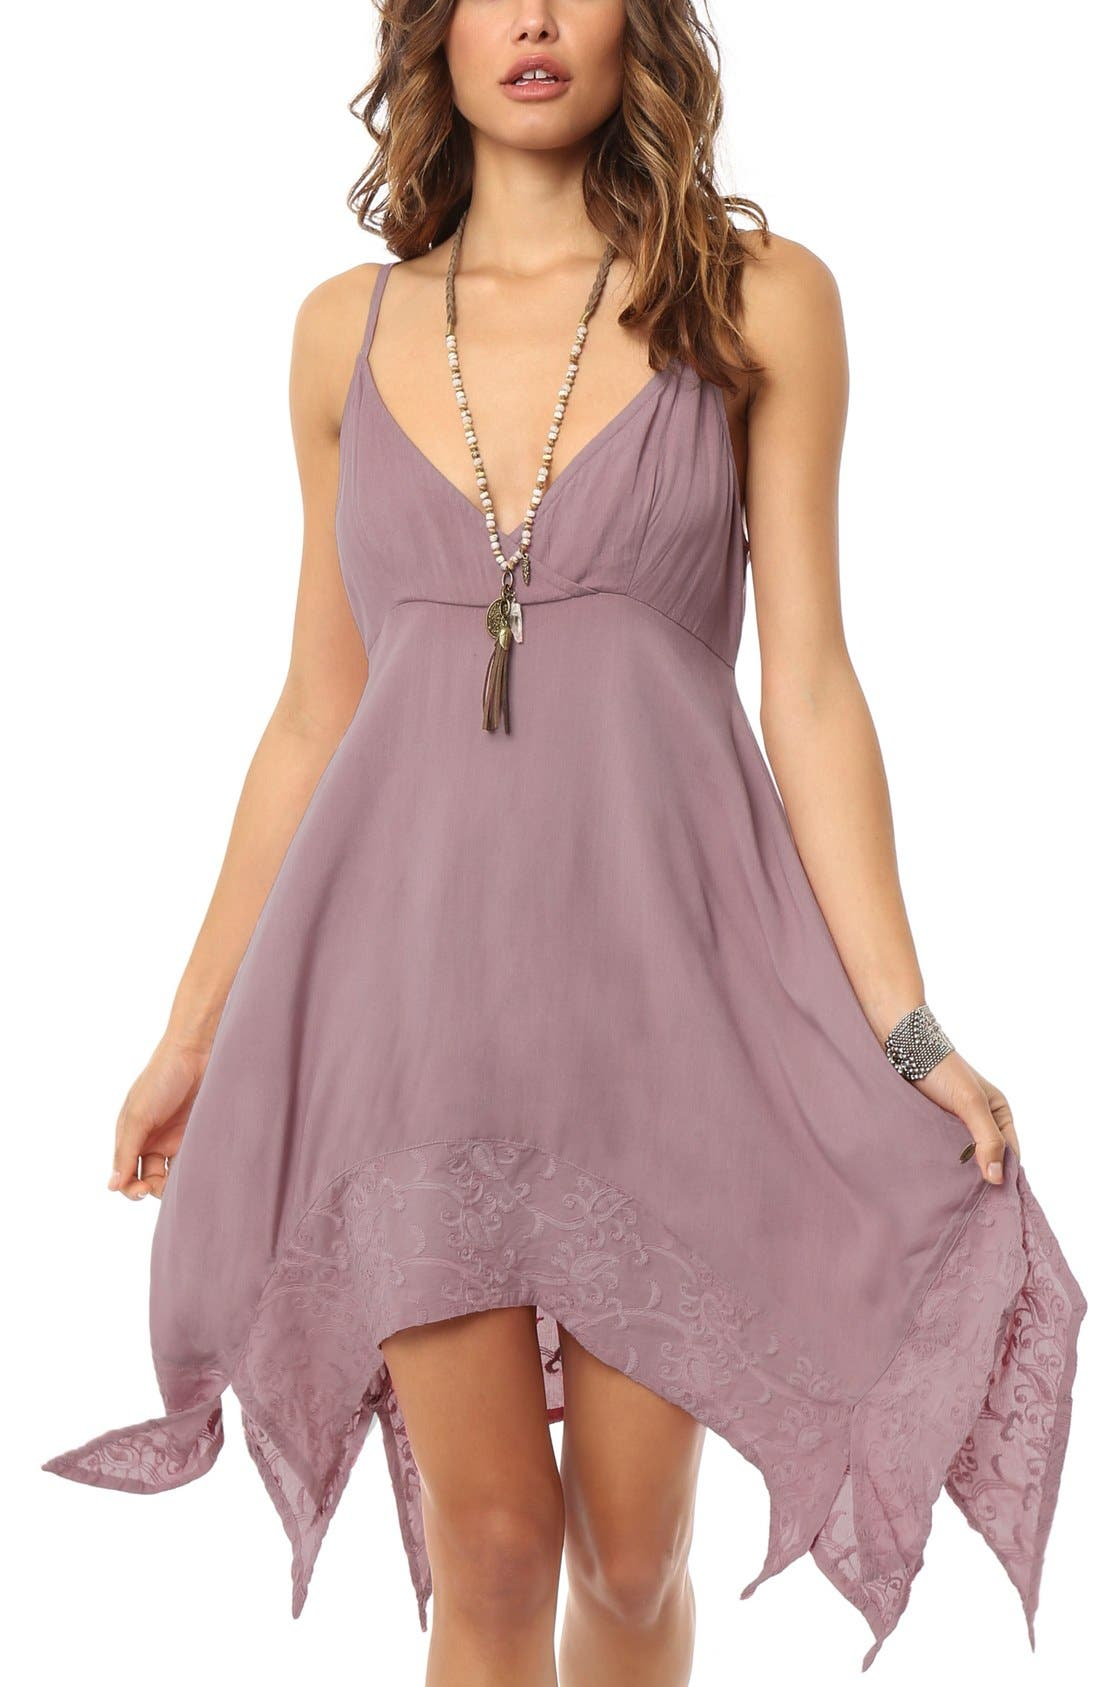 Alternate Image 1 Selected - O'Neill 'Jillian' Embroidered Dress